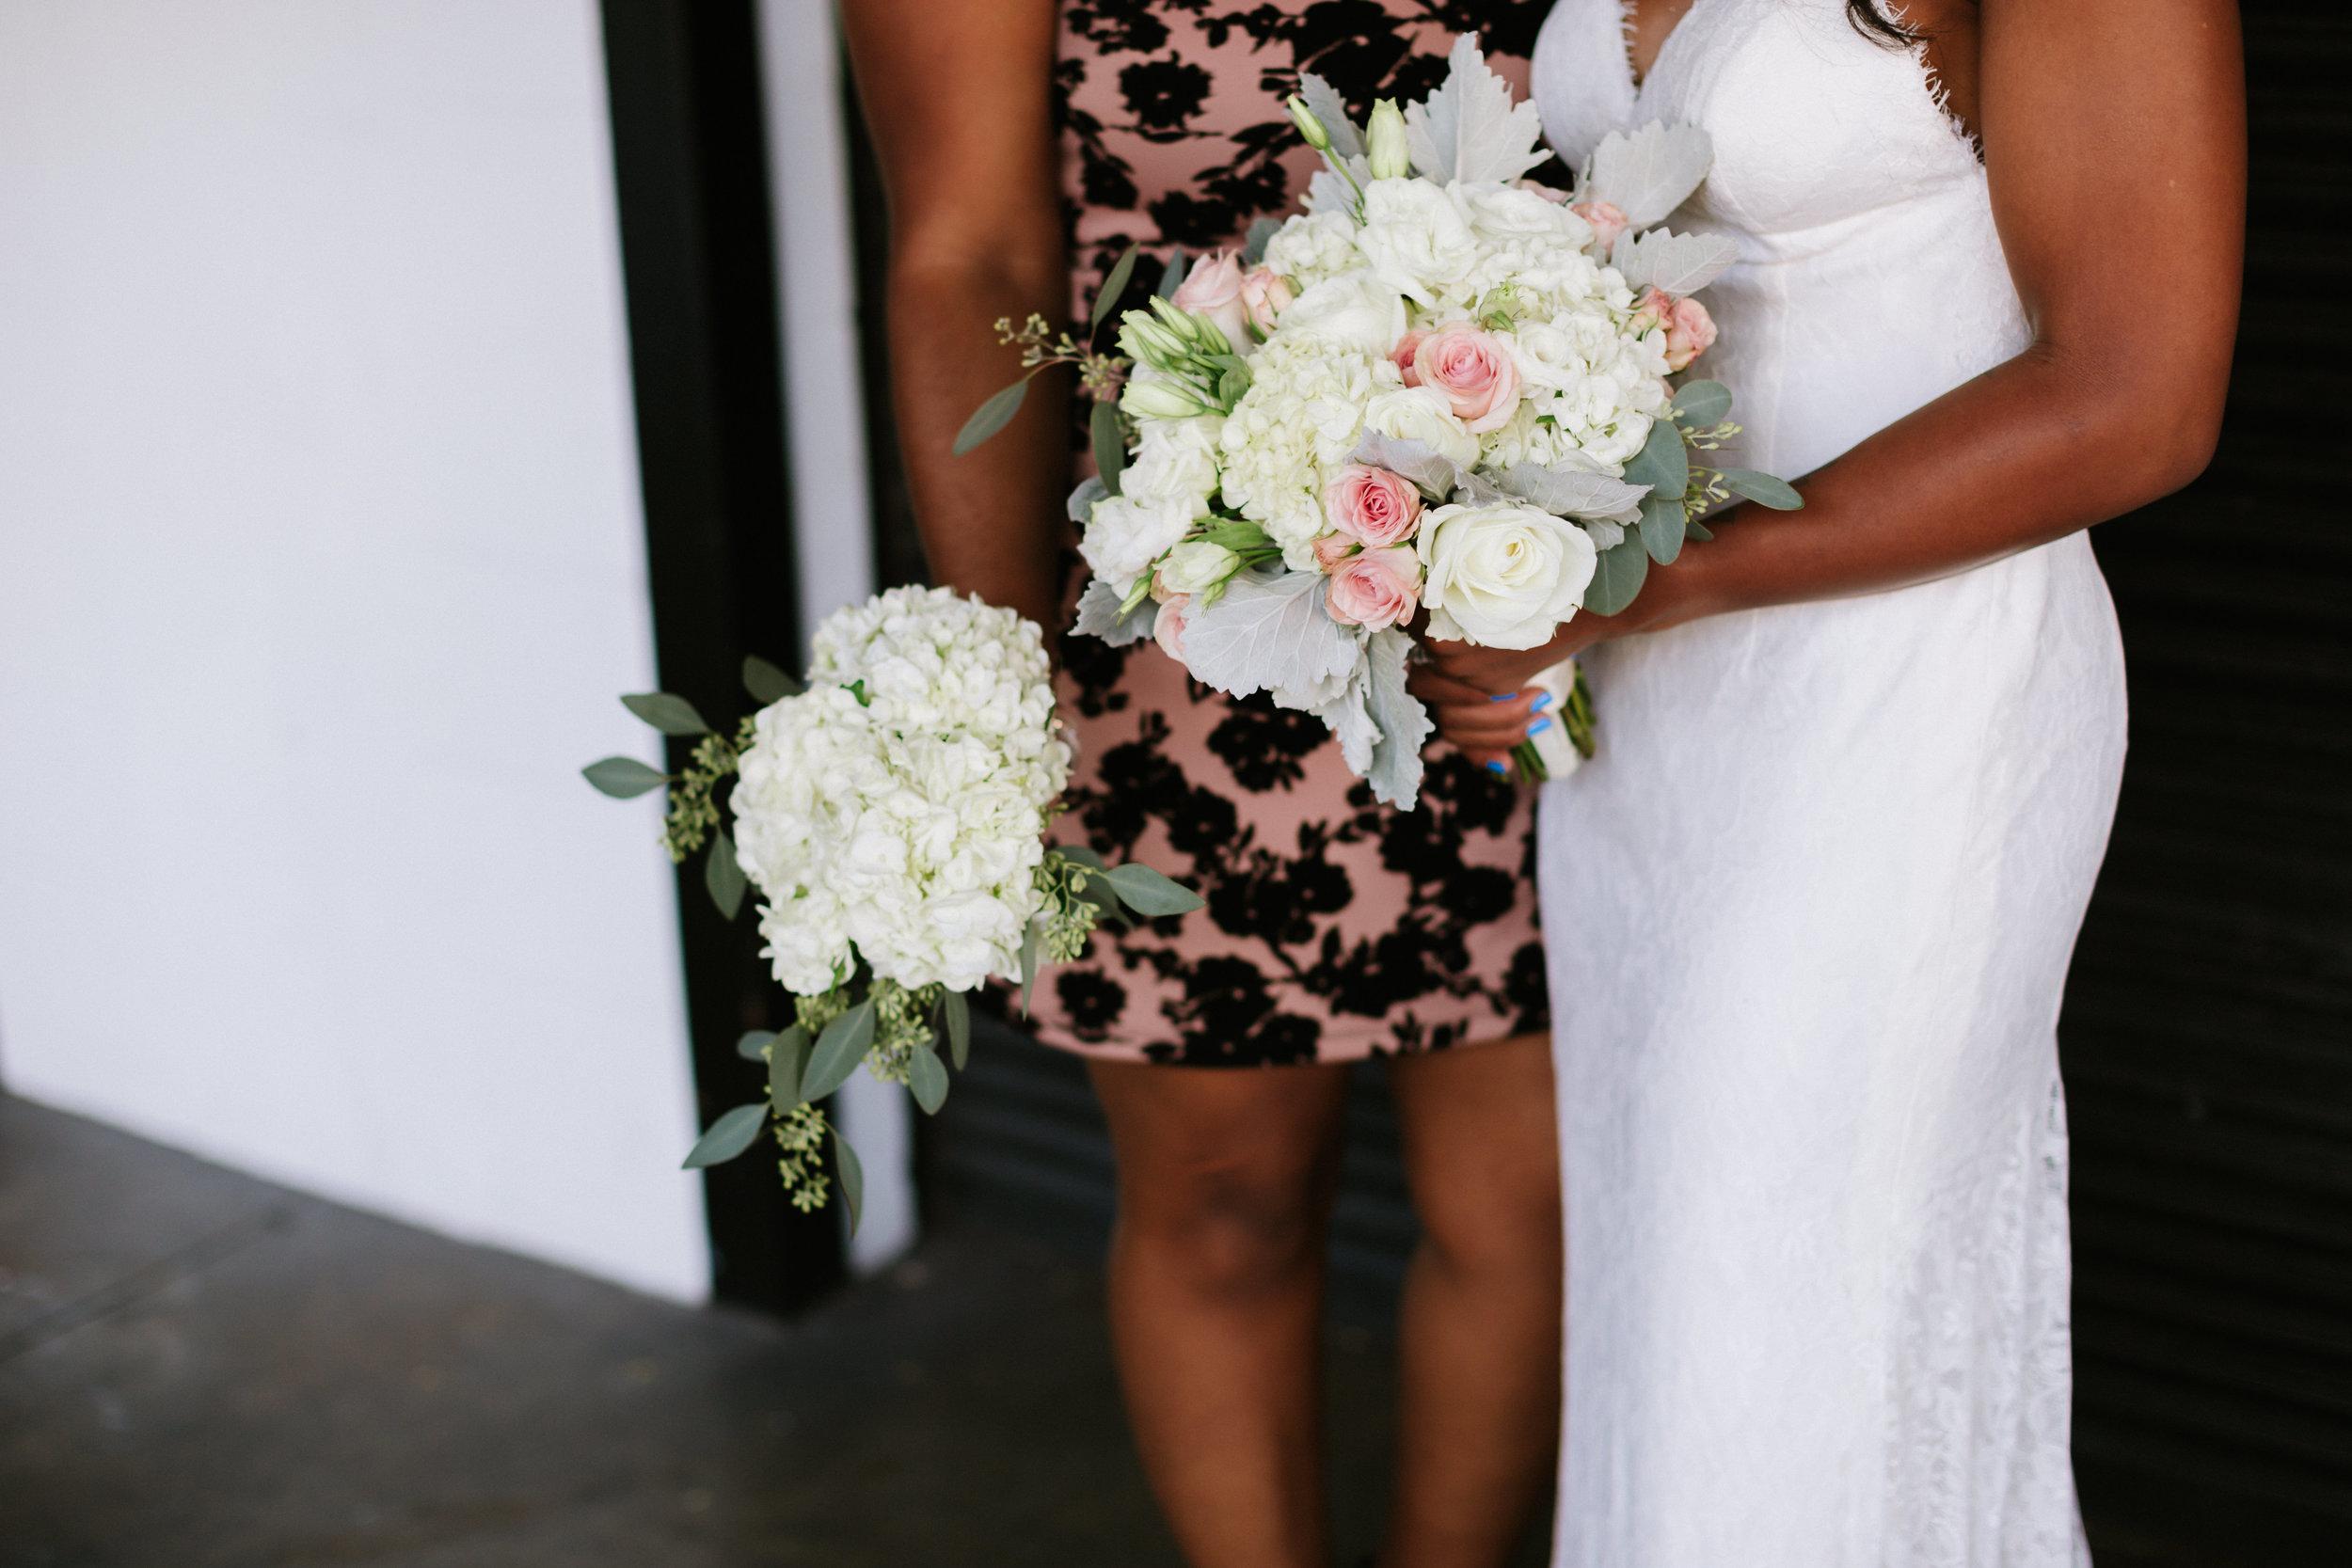 2017.09.16 Ashley and Chuck O'Day Quantam Leap Winery Wedding (222 of 462).jpg